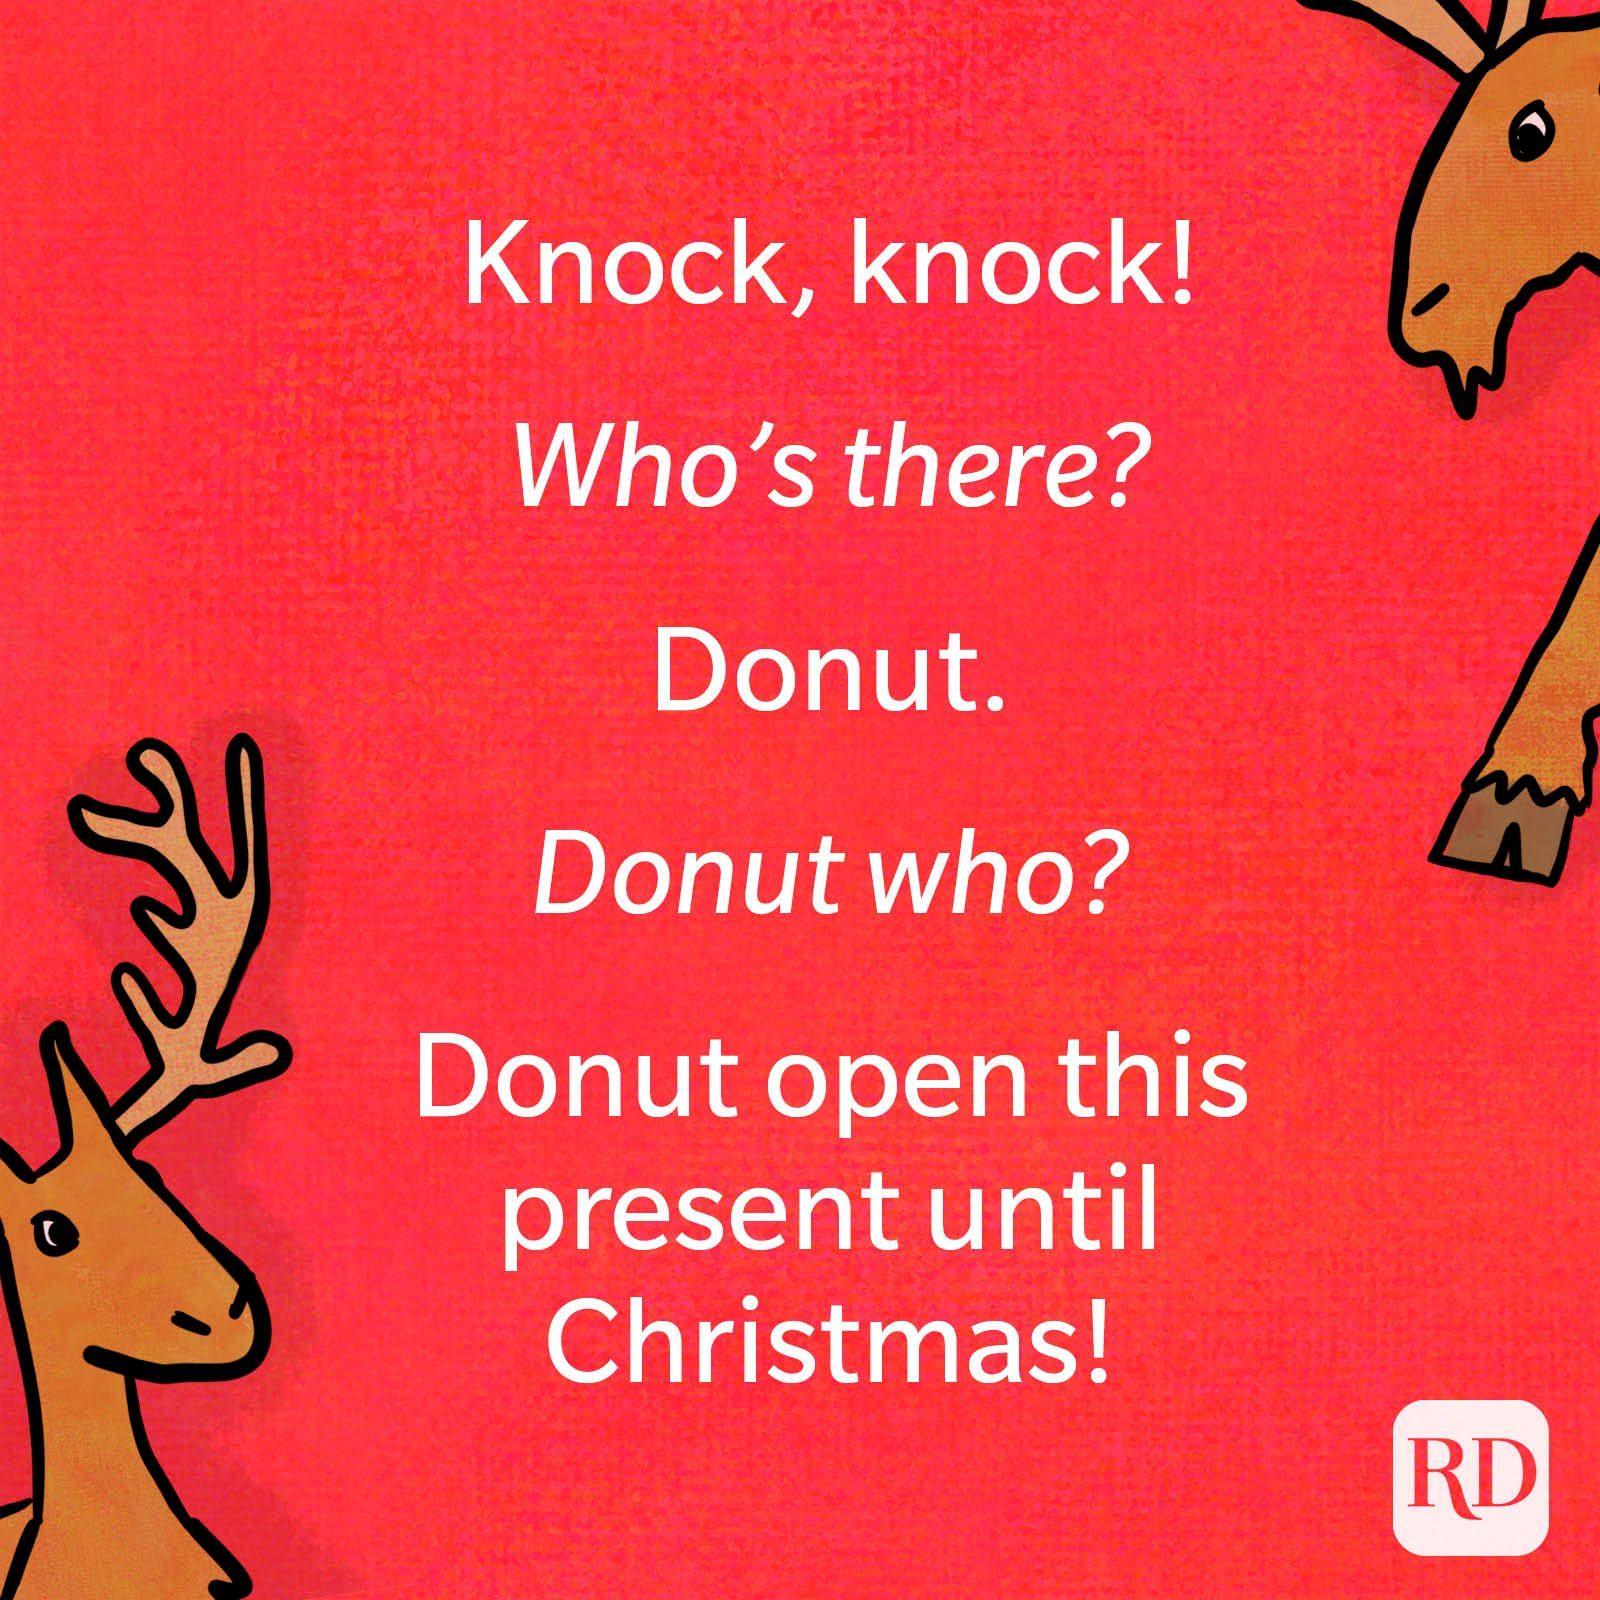 Knock, knock!